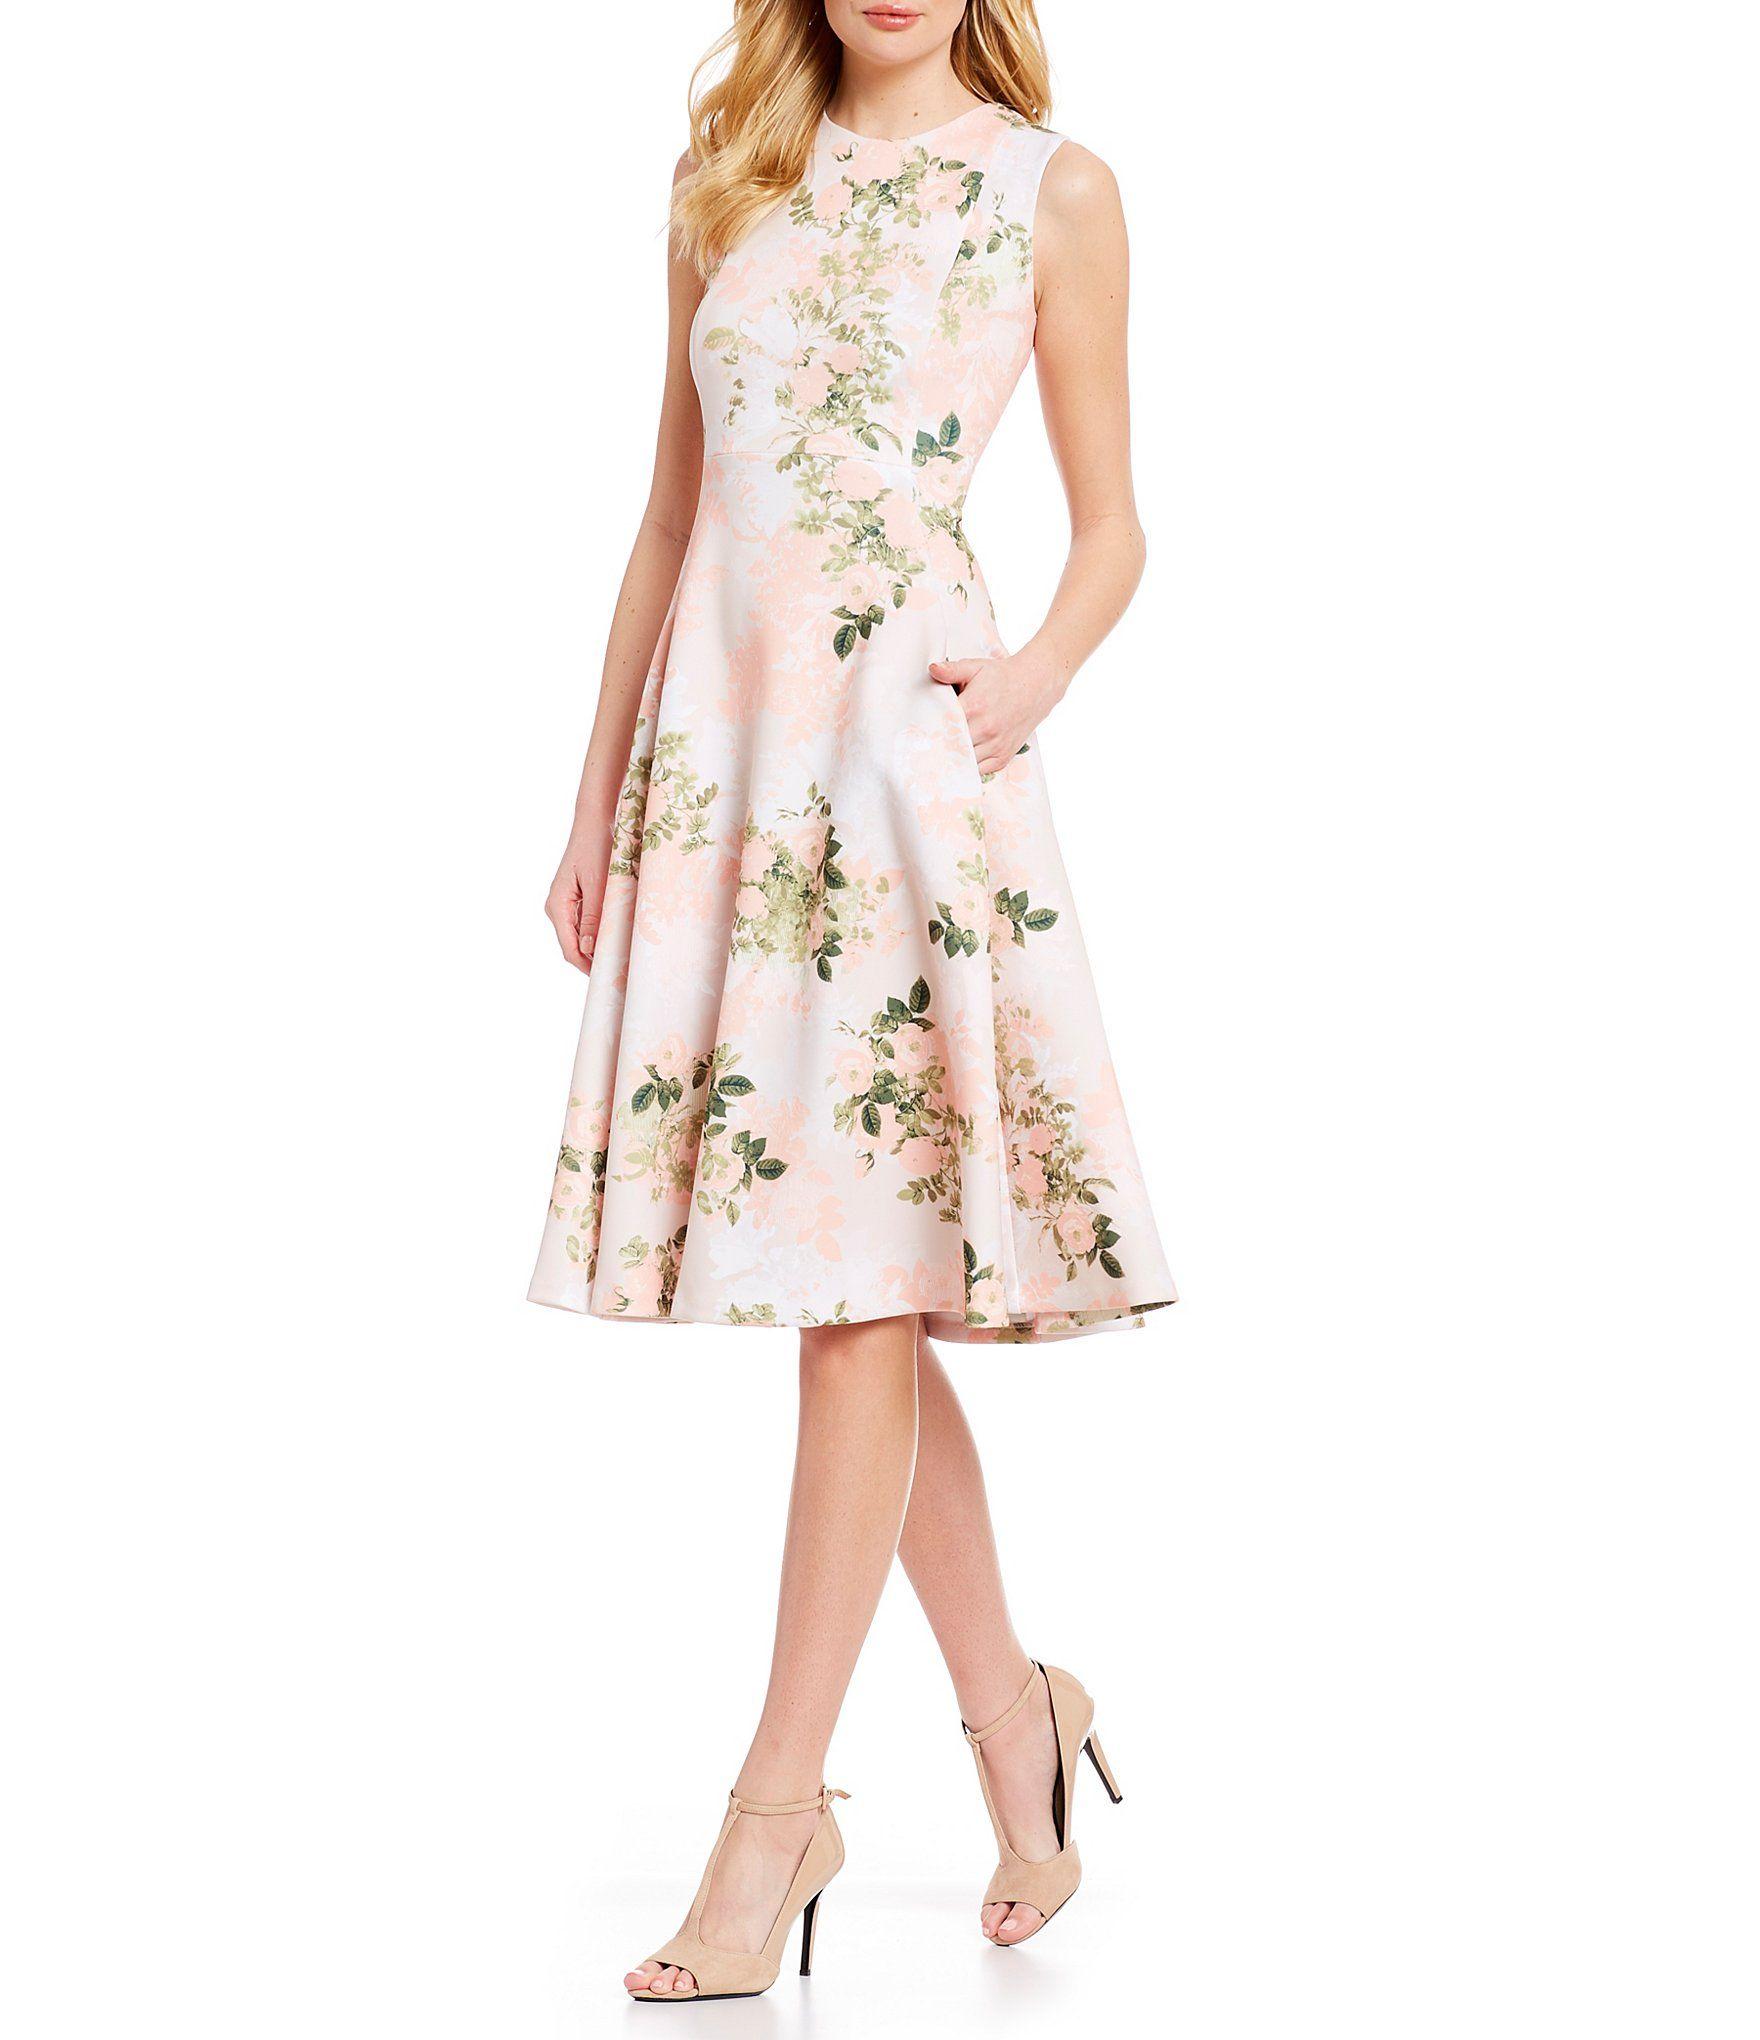 Calvin Klein Floral Print Fit Flare Sleeveless Midi Dress Dillards Printed Halter Dress Womens Dresses Fit Flare Dress [ 2040 x 1760 Pixel ]